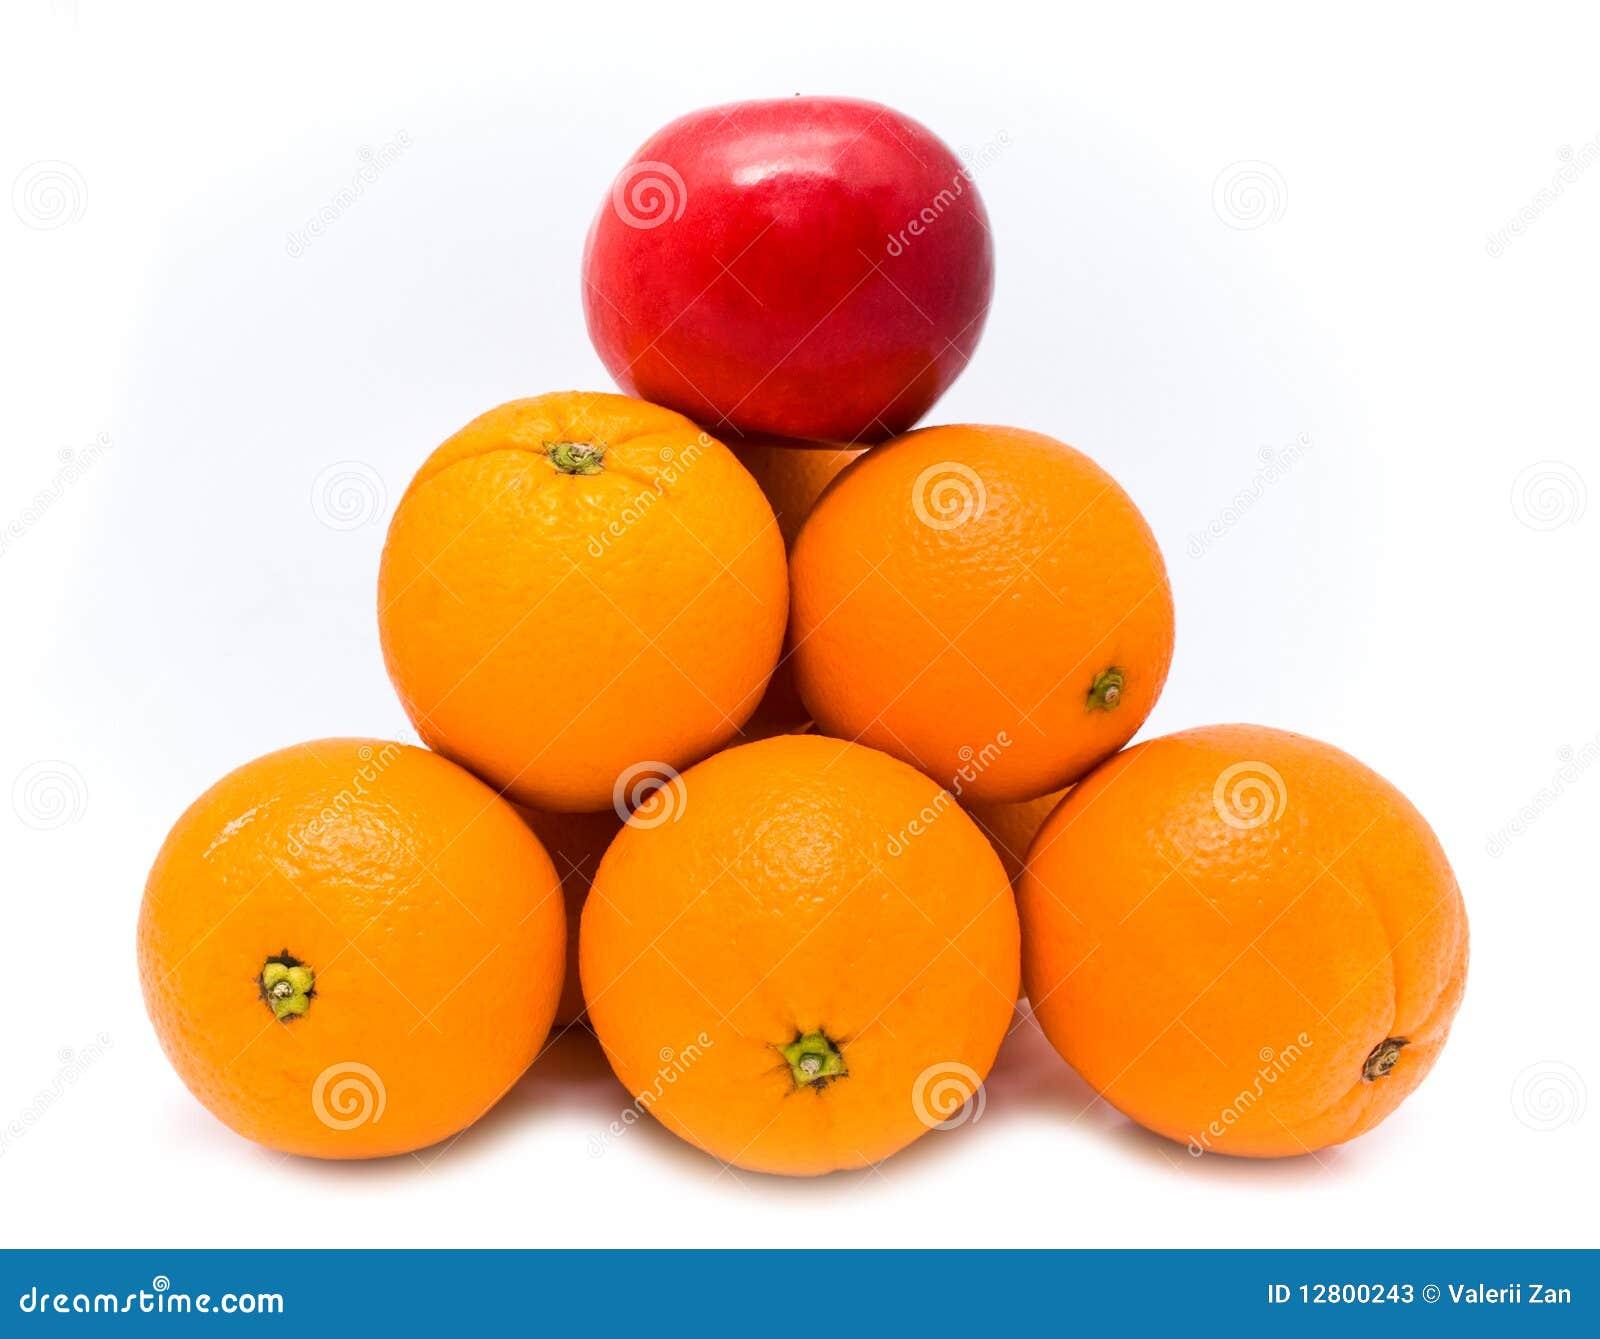 Pirâmide com laranja e maçã